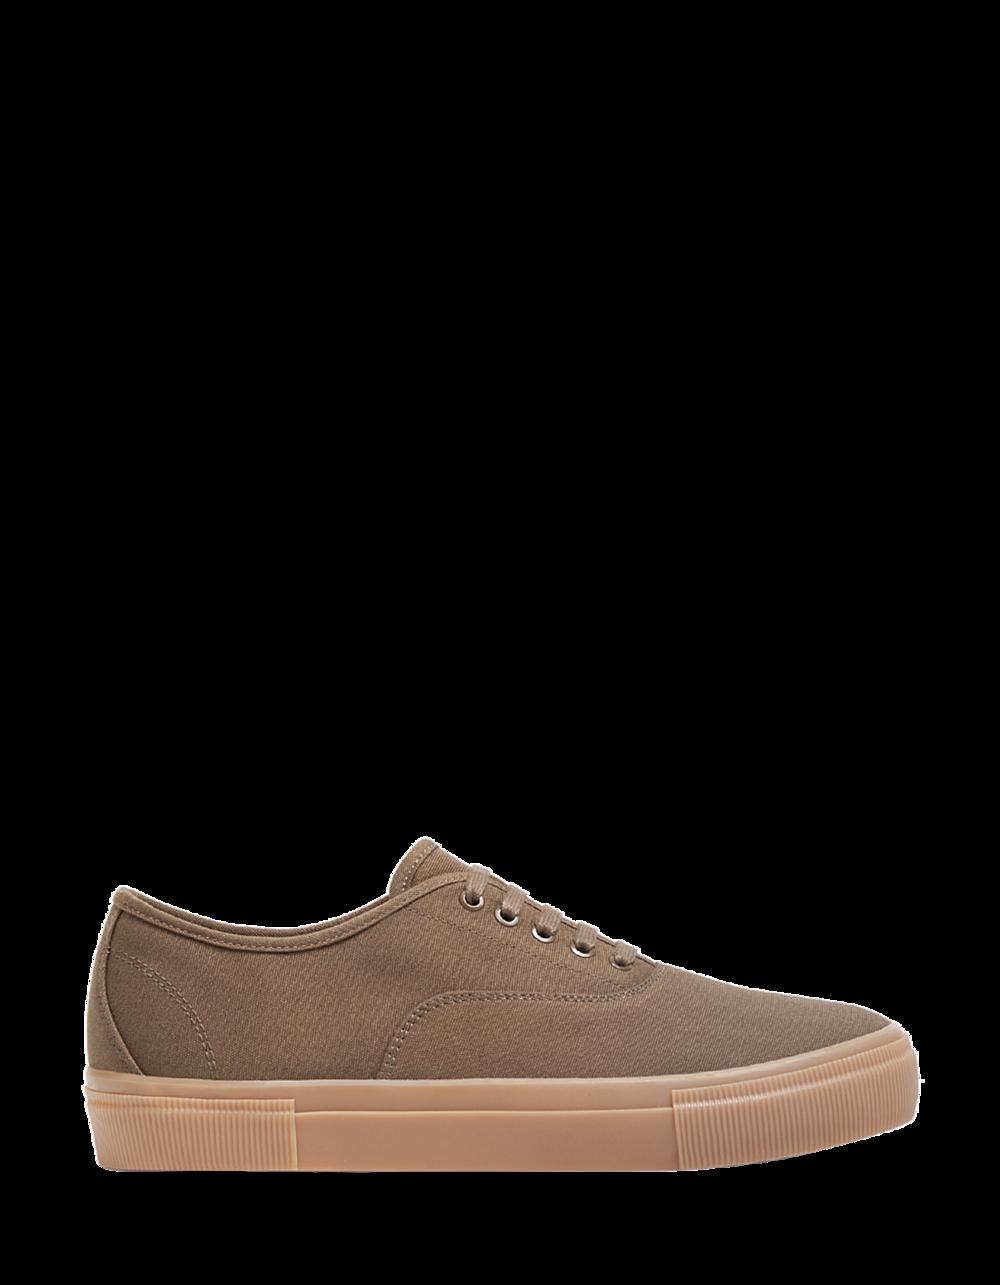 StradivariusMan_shoes (11).png